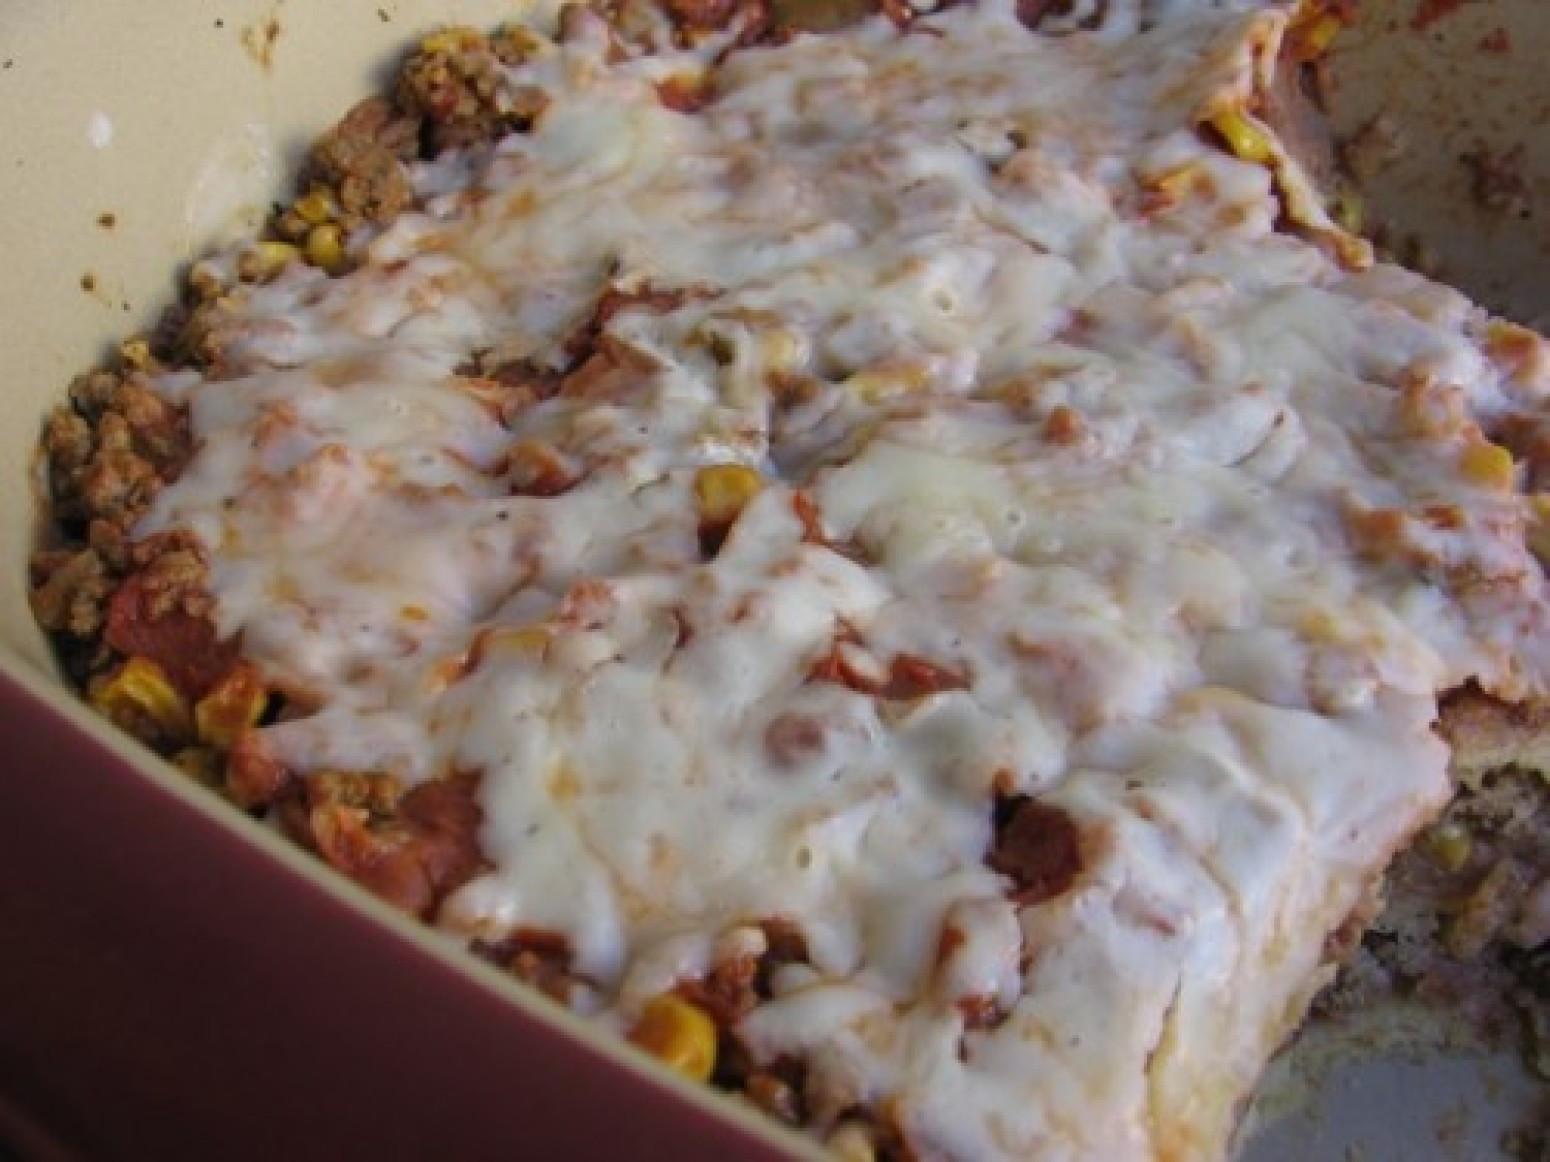 Healthy Ground Beef Casserole Recipes  Slim & Healthy Ground Beef Enchilada Casserole Recipe